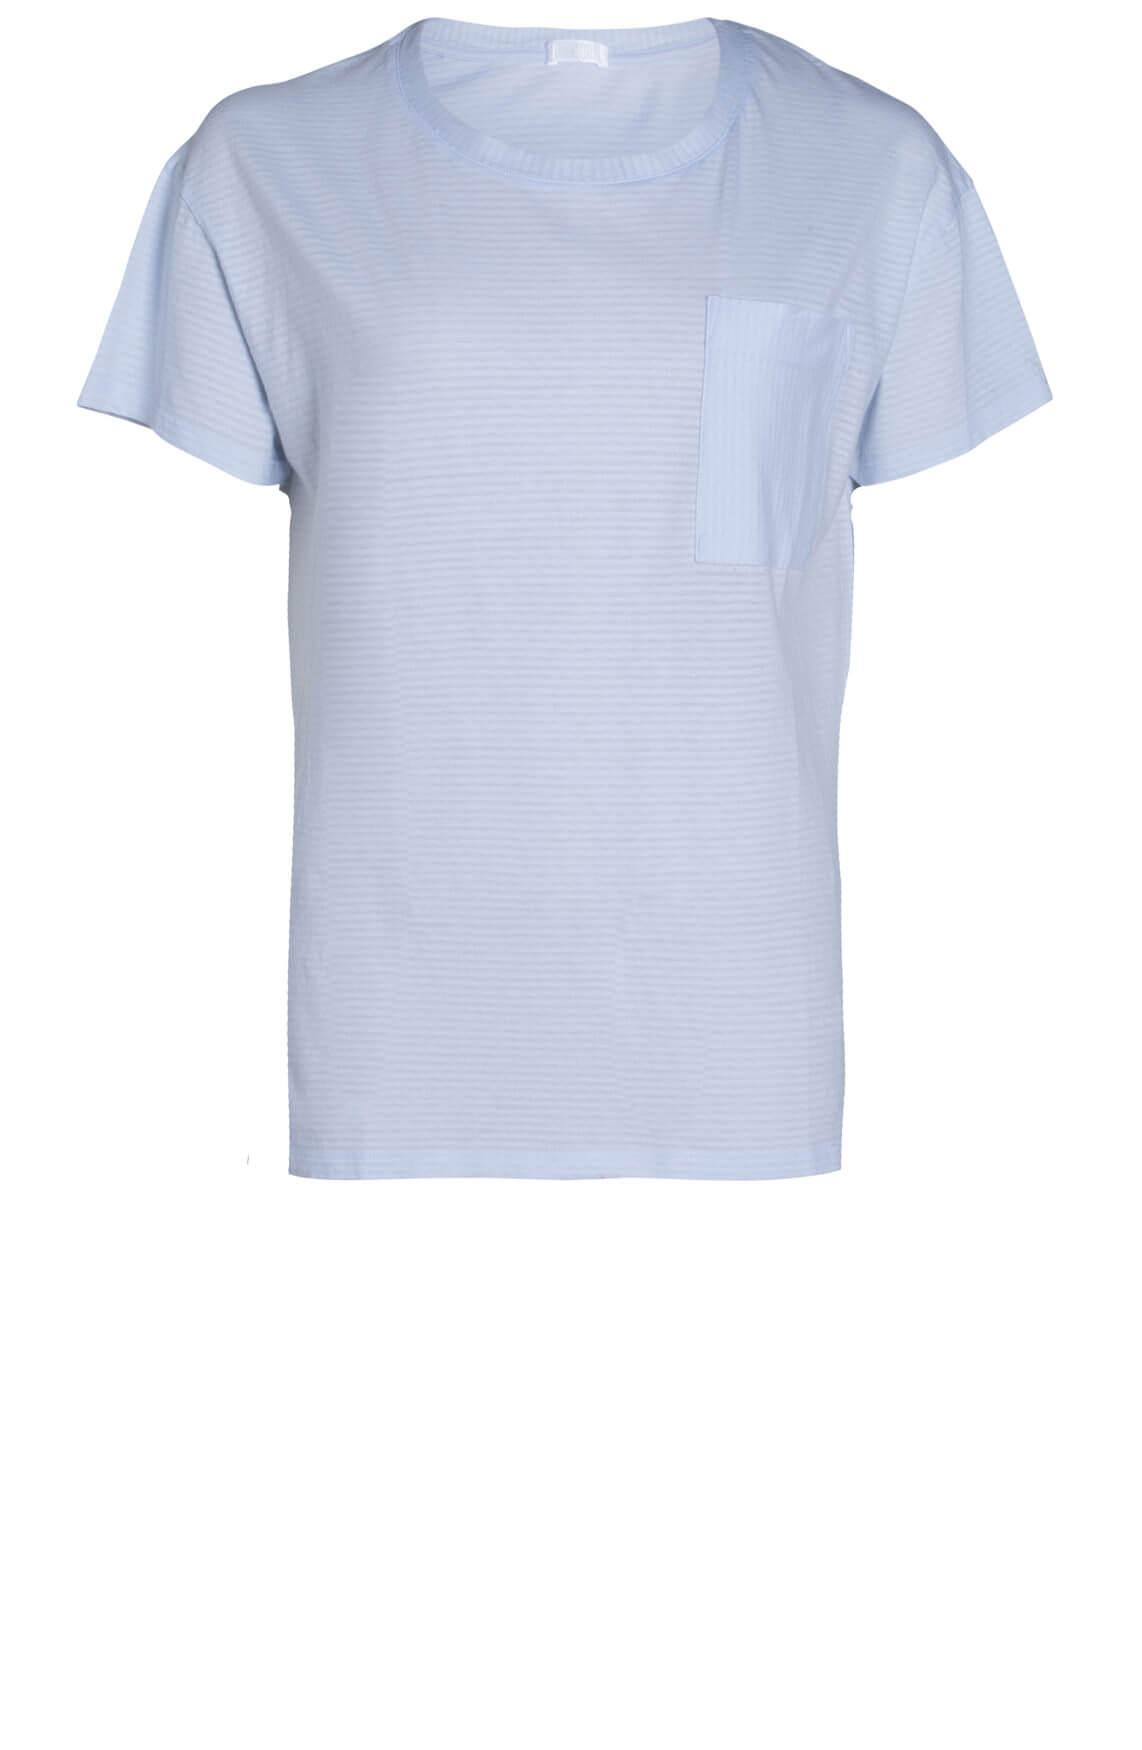 Drykorn Dames Letice shirt Blauw